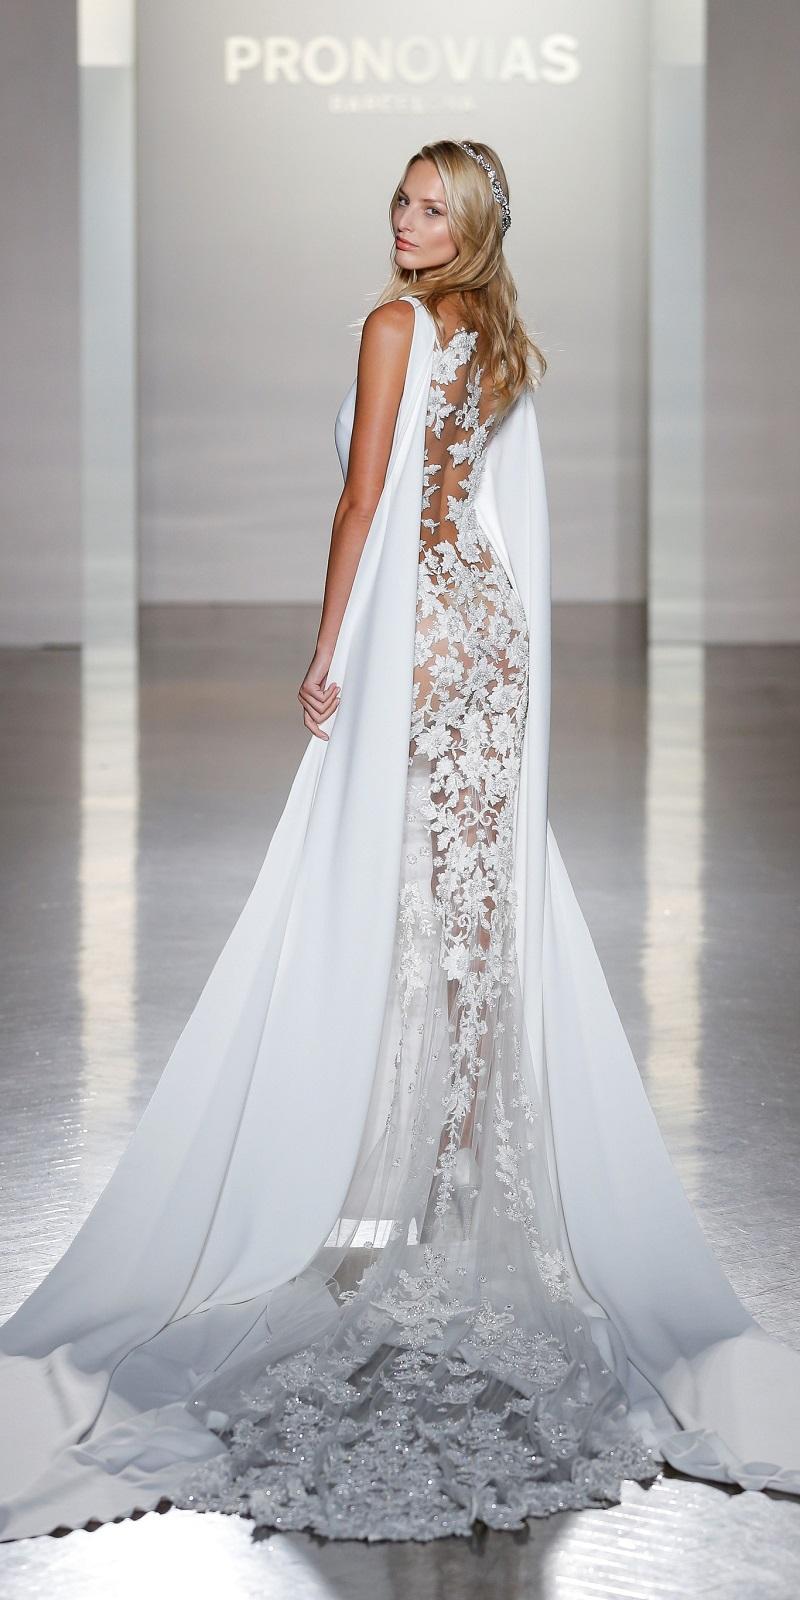 Pronovias 2017 brides collection